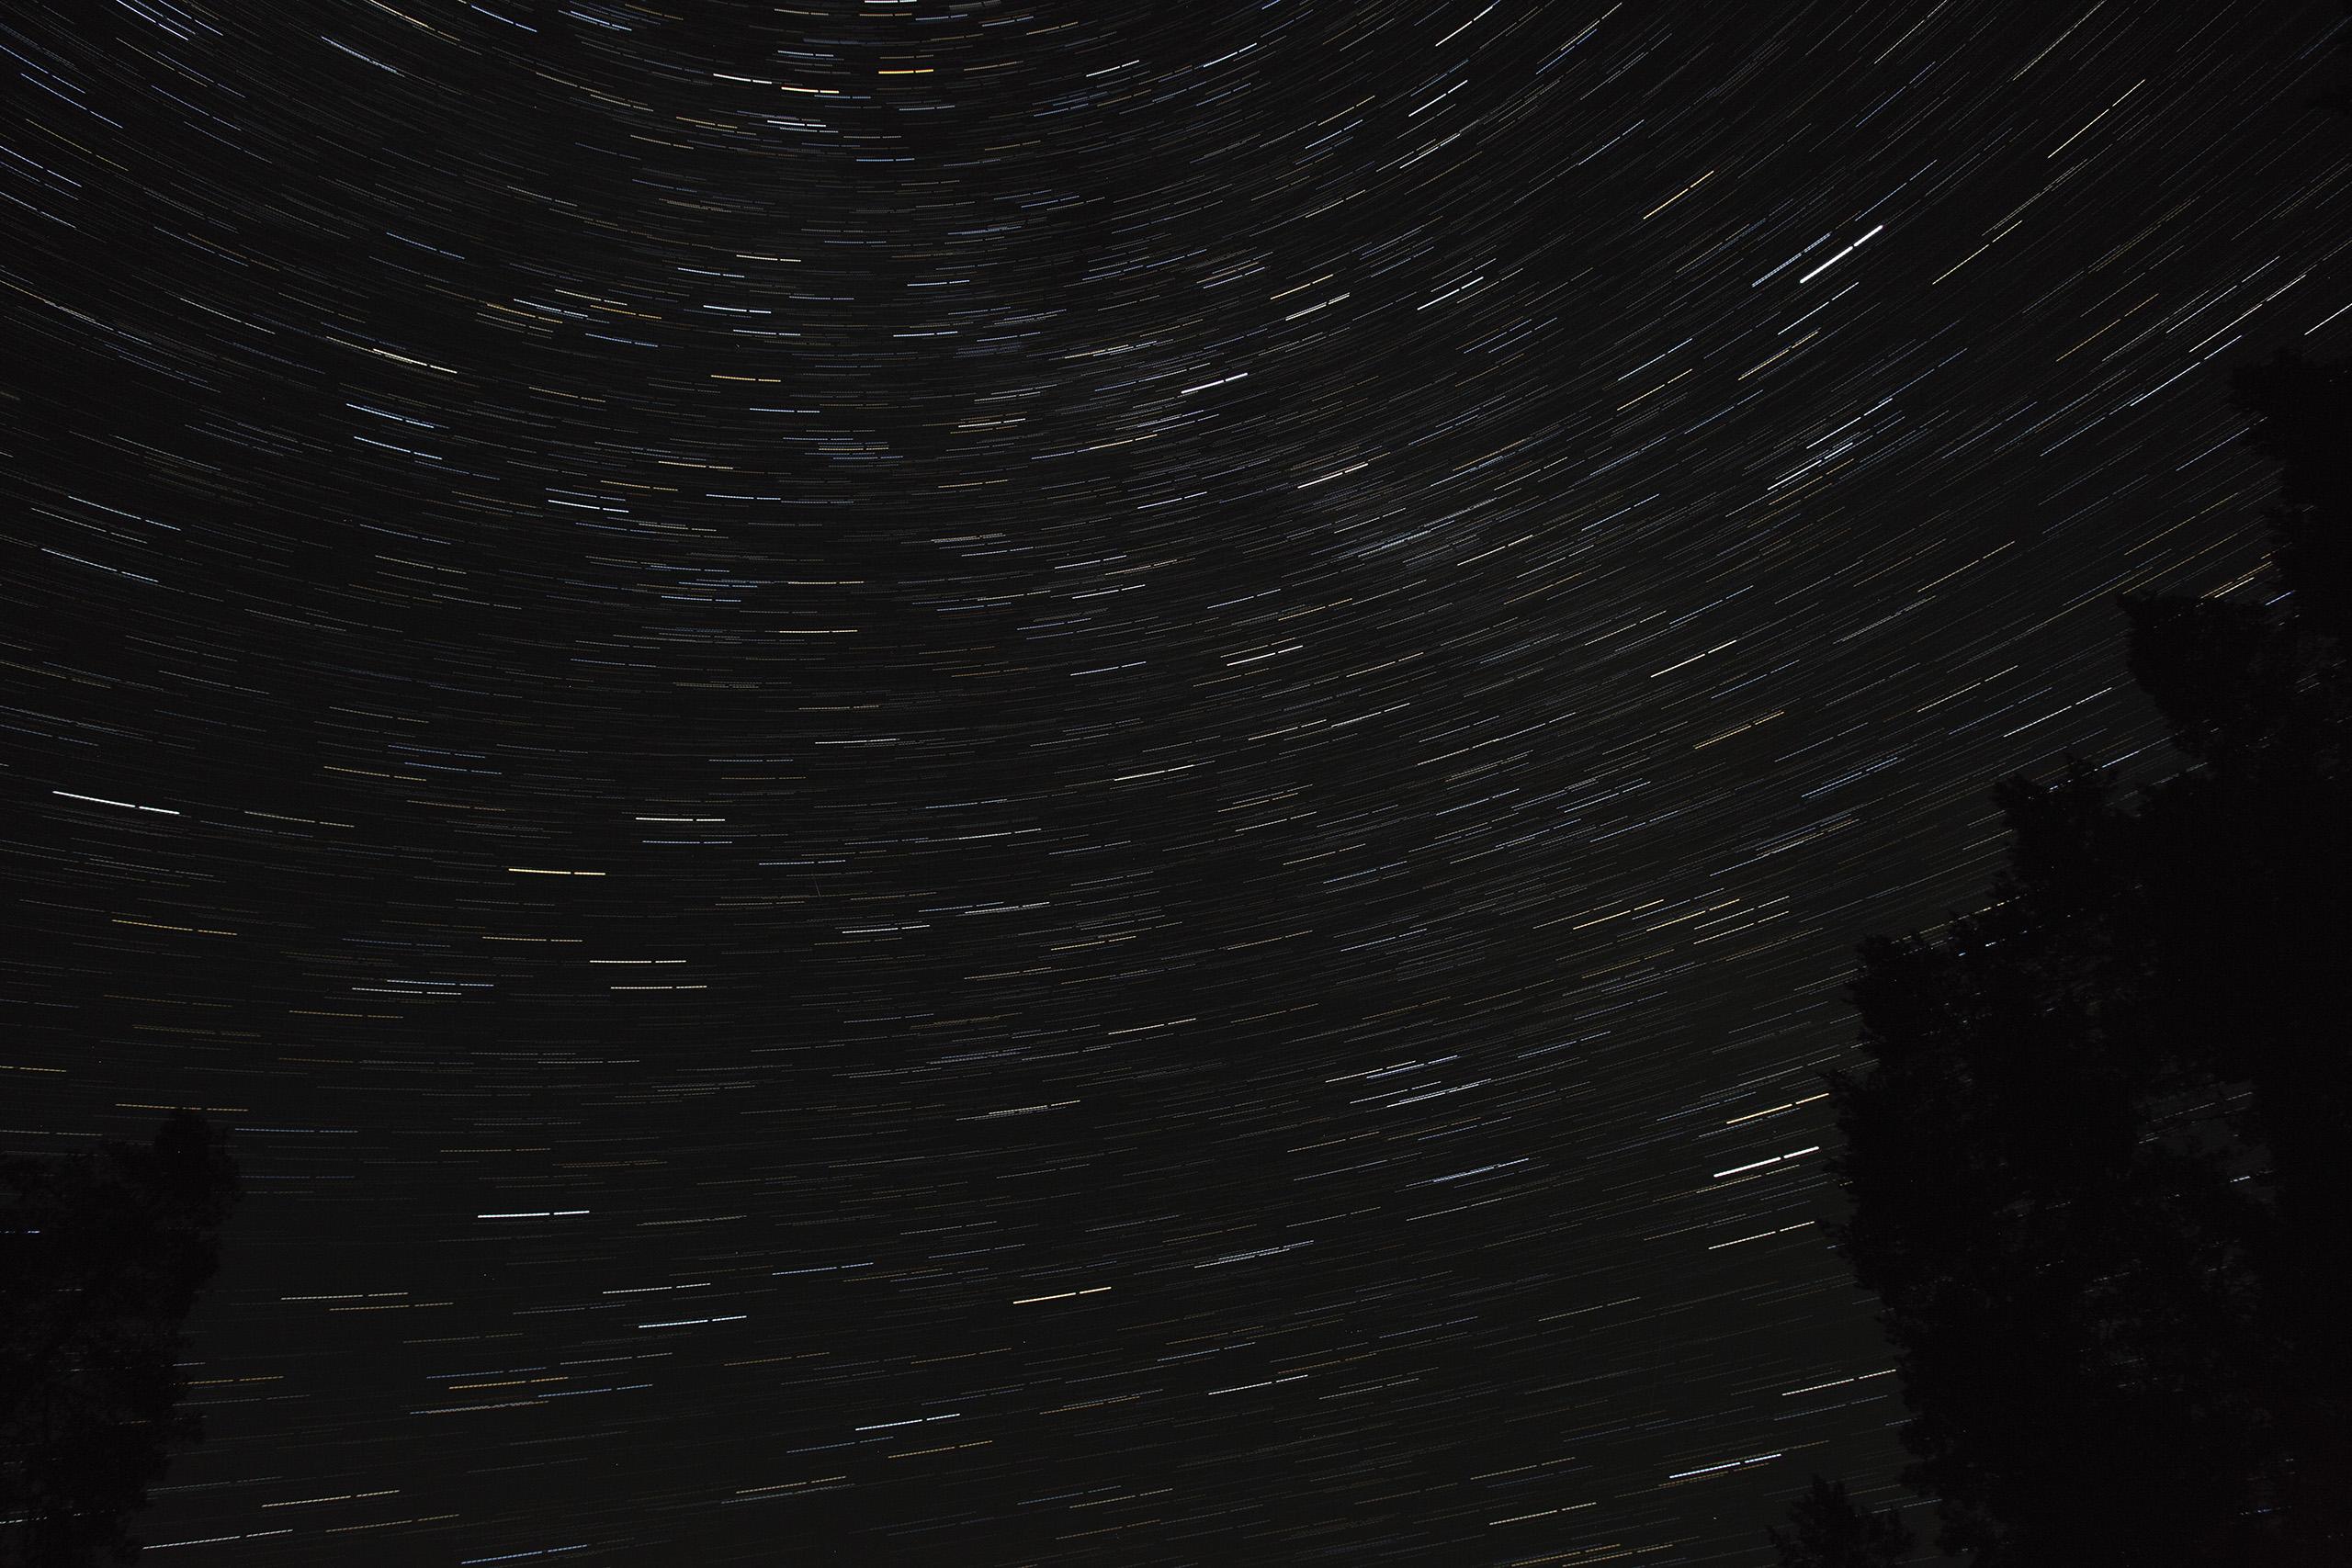 star-trails-160827